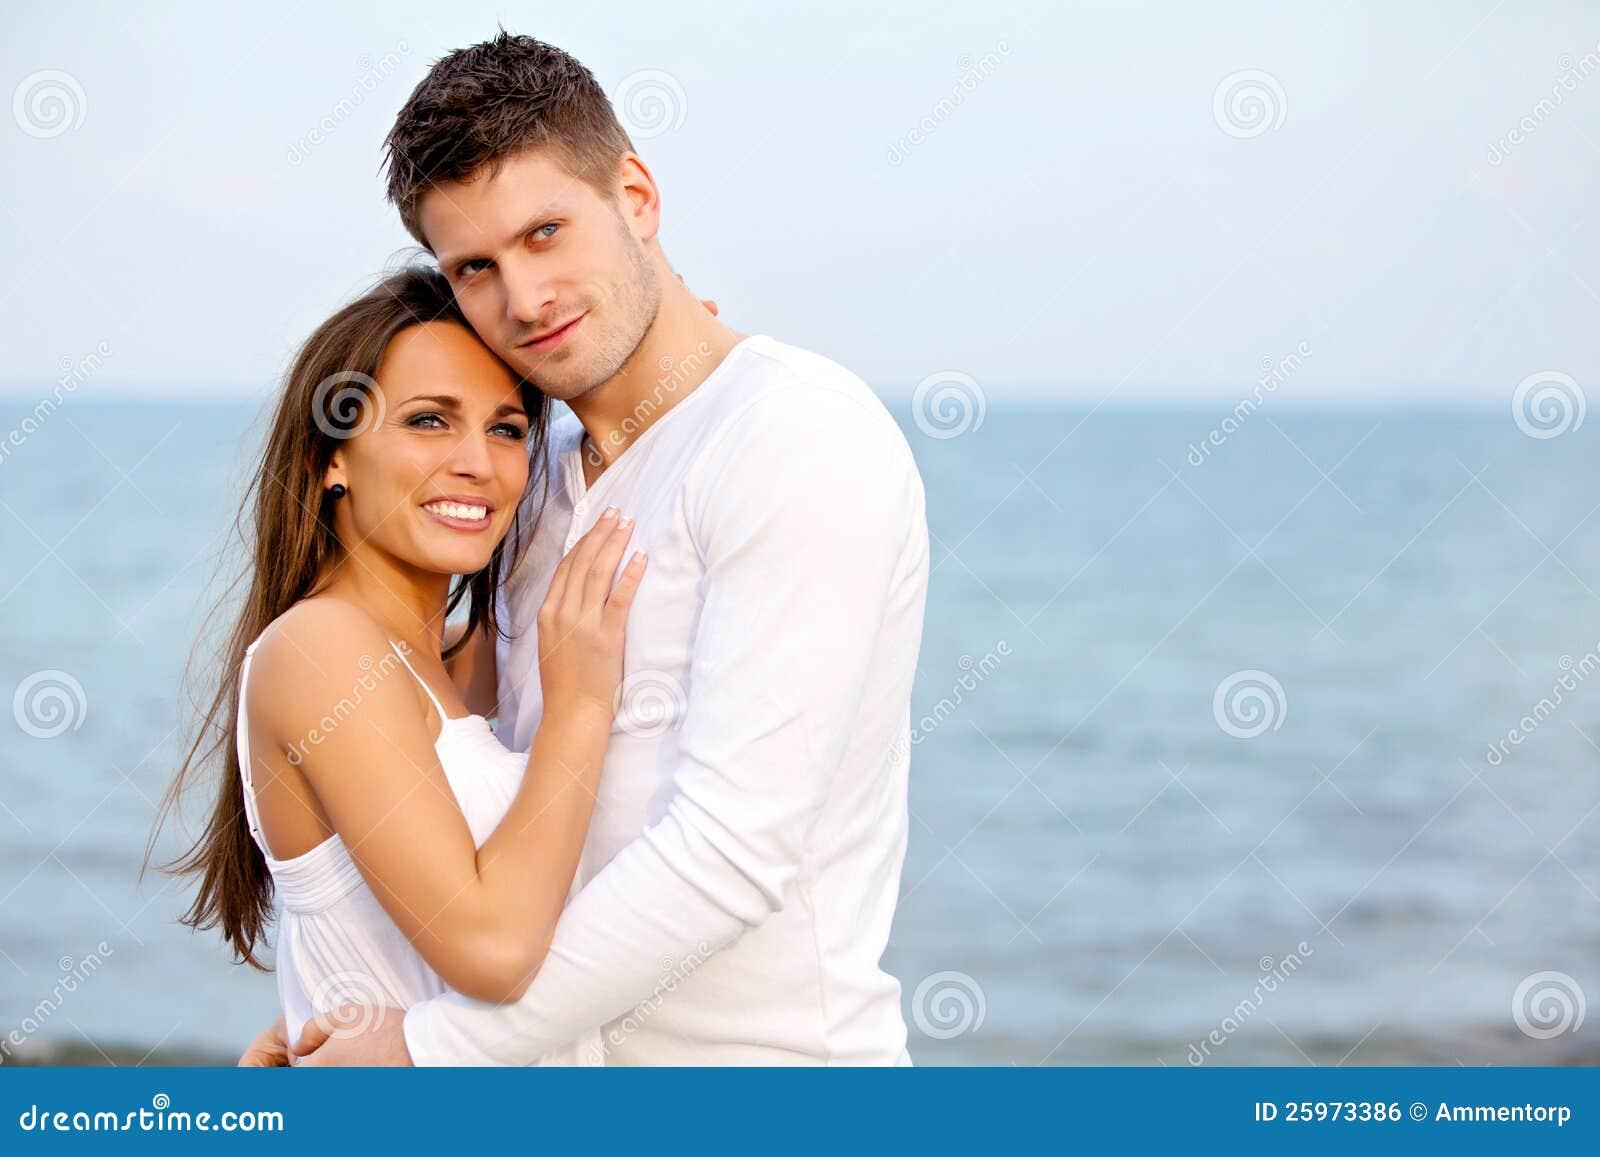 romantic couple posing at the beach stock photo image of light